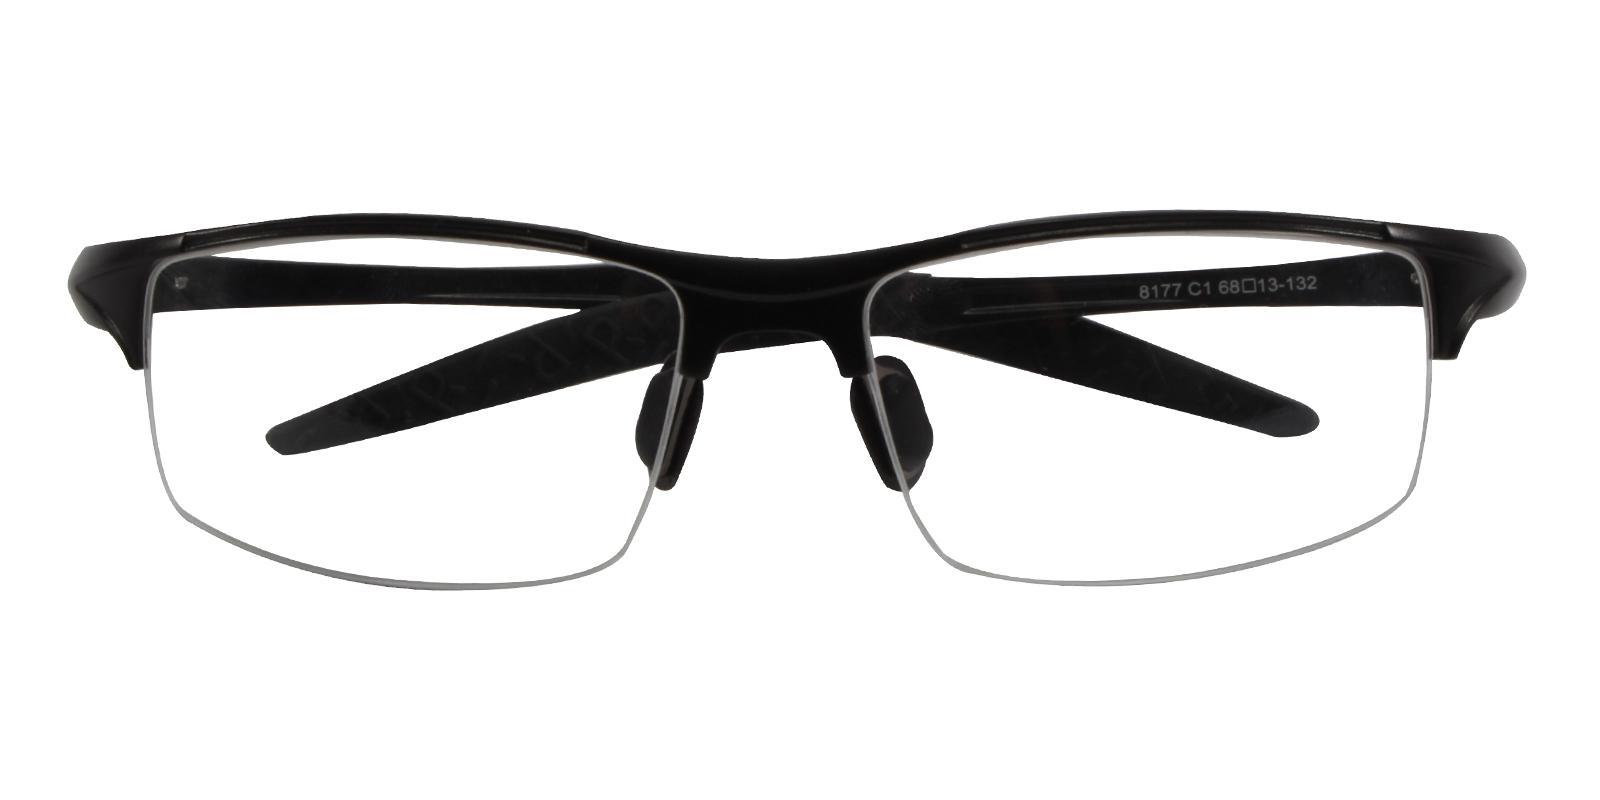 Pathfinder Black Metal NosePads , SportsGlasses , SpringHinges Frames from ABBE Glasses